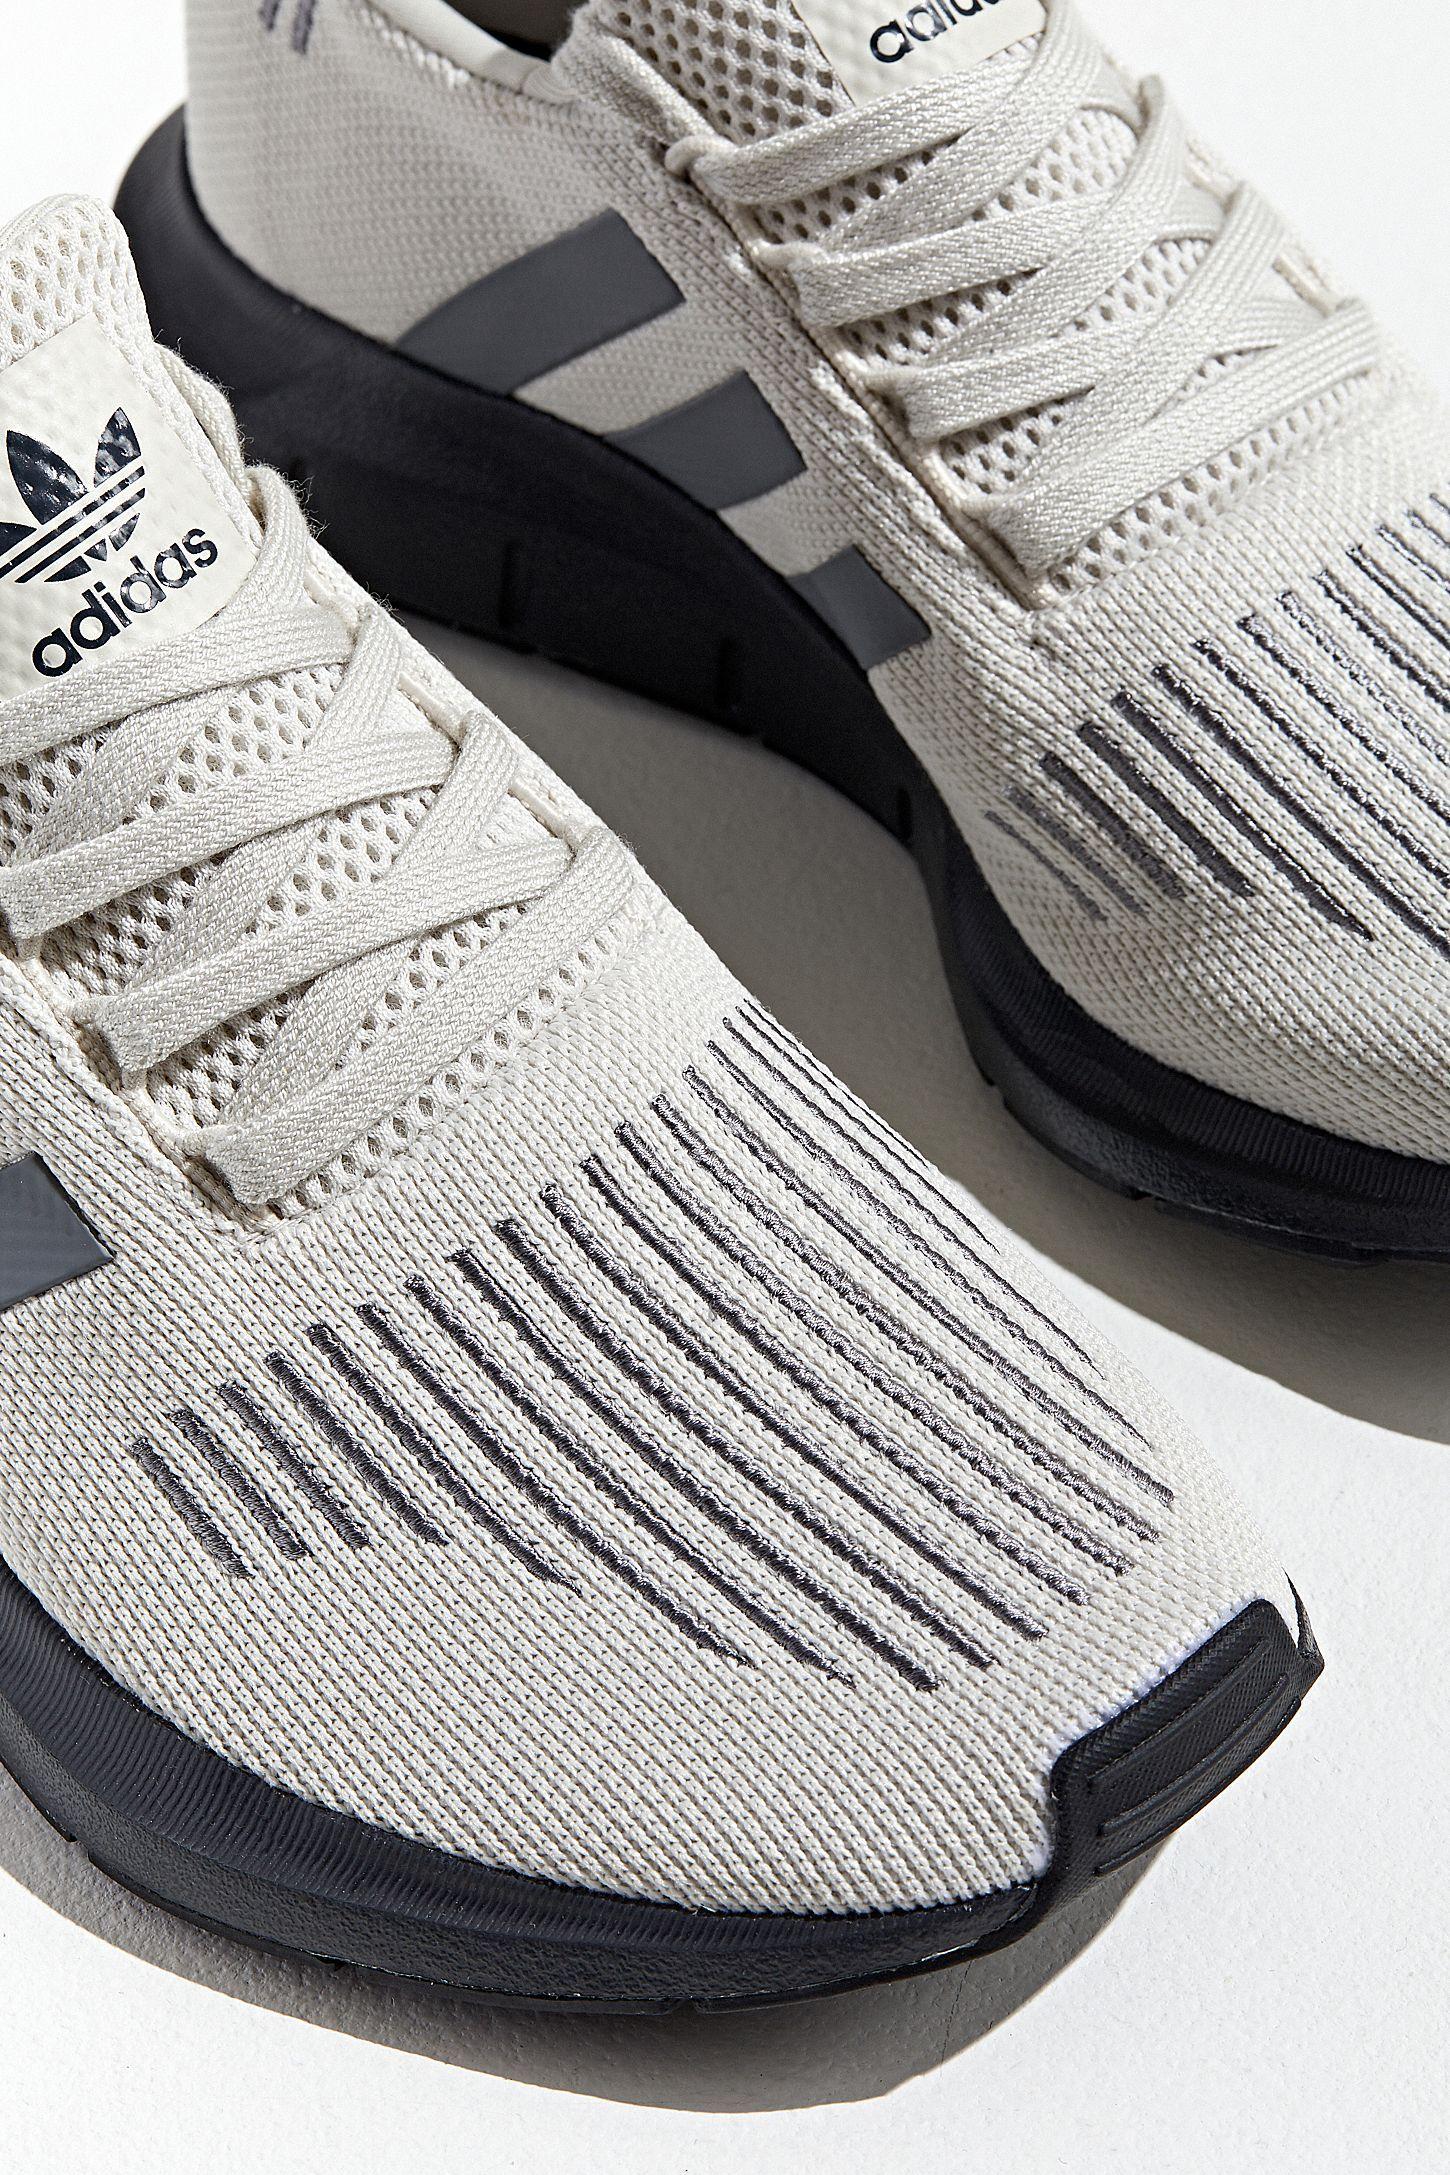 Competir presente clima  adidas Swift Run Sneaker | Running shoes outfits, Adidas, Womens tennis  shoes